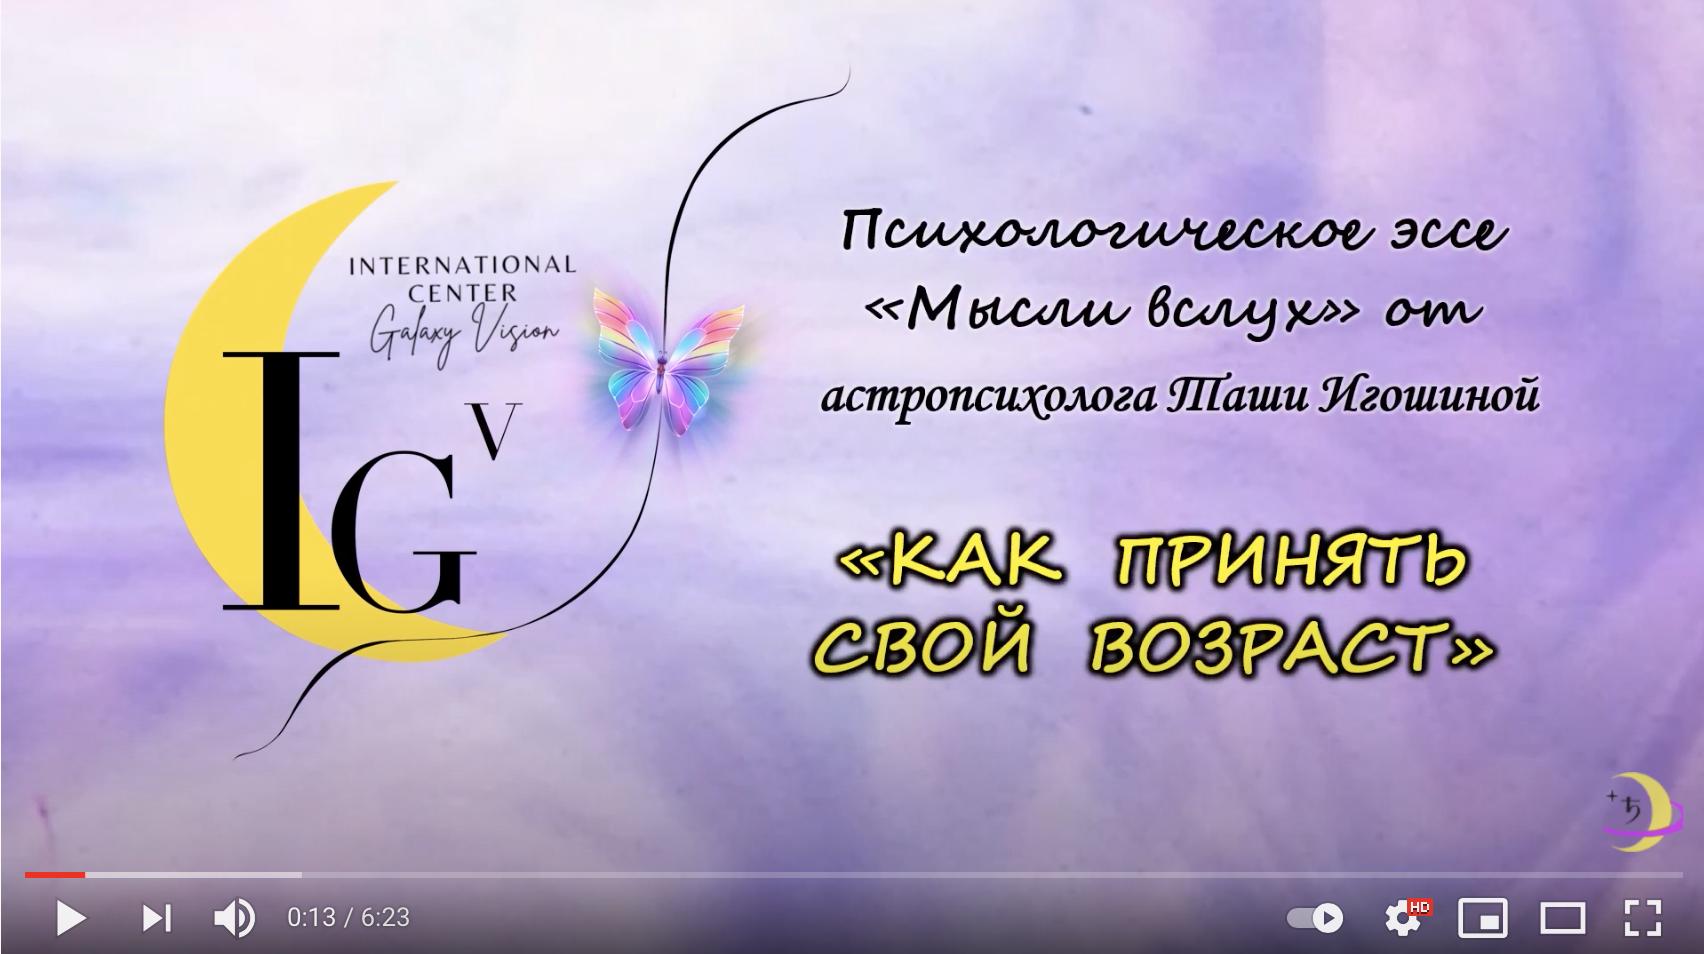 https://astrologtasha.ru/wp-content/uploads/2021/04/Screen-Shot-2021-04-13-at-11.56.20-PM-2.png